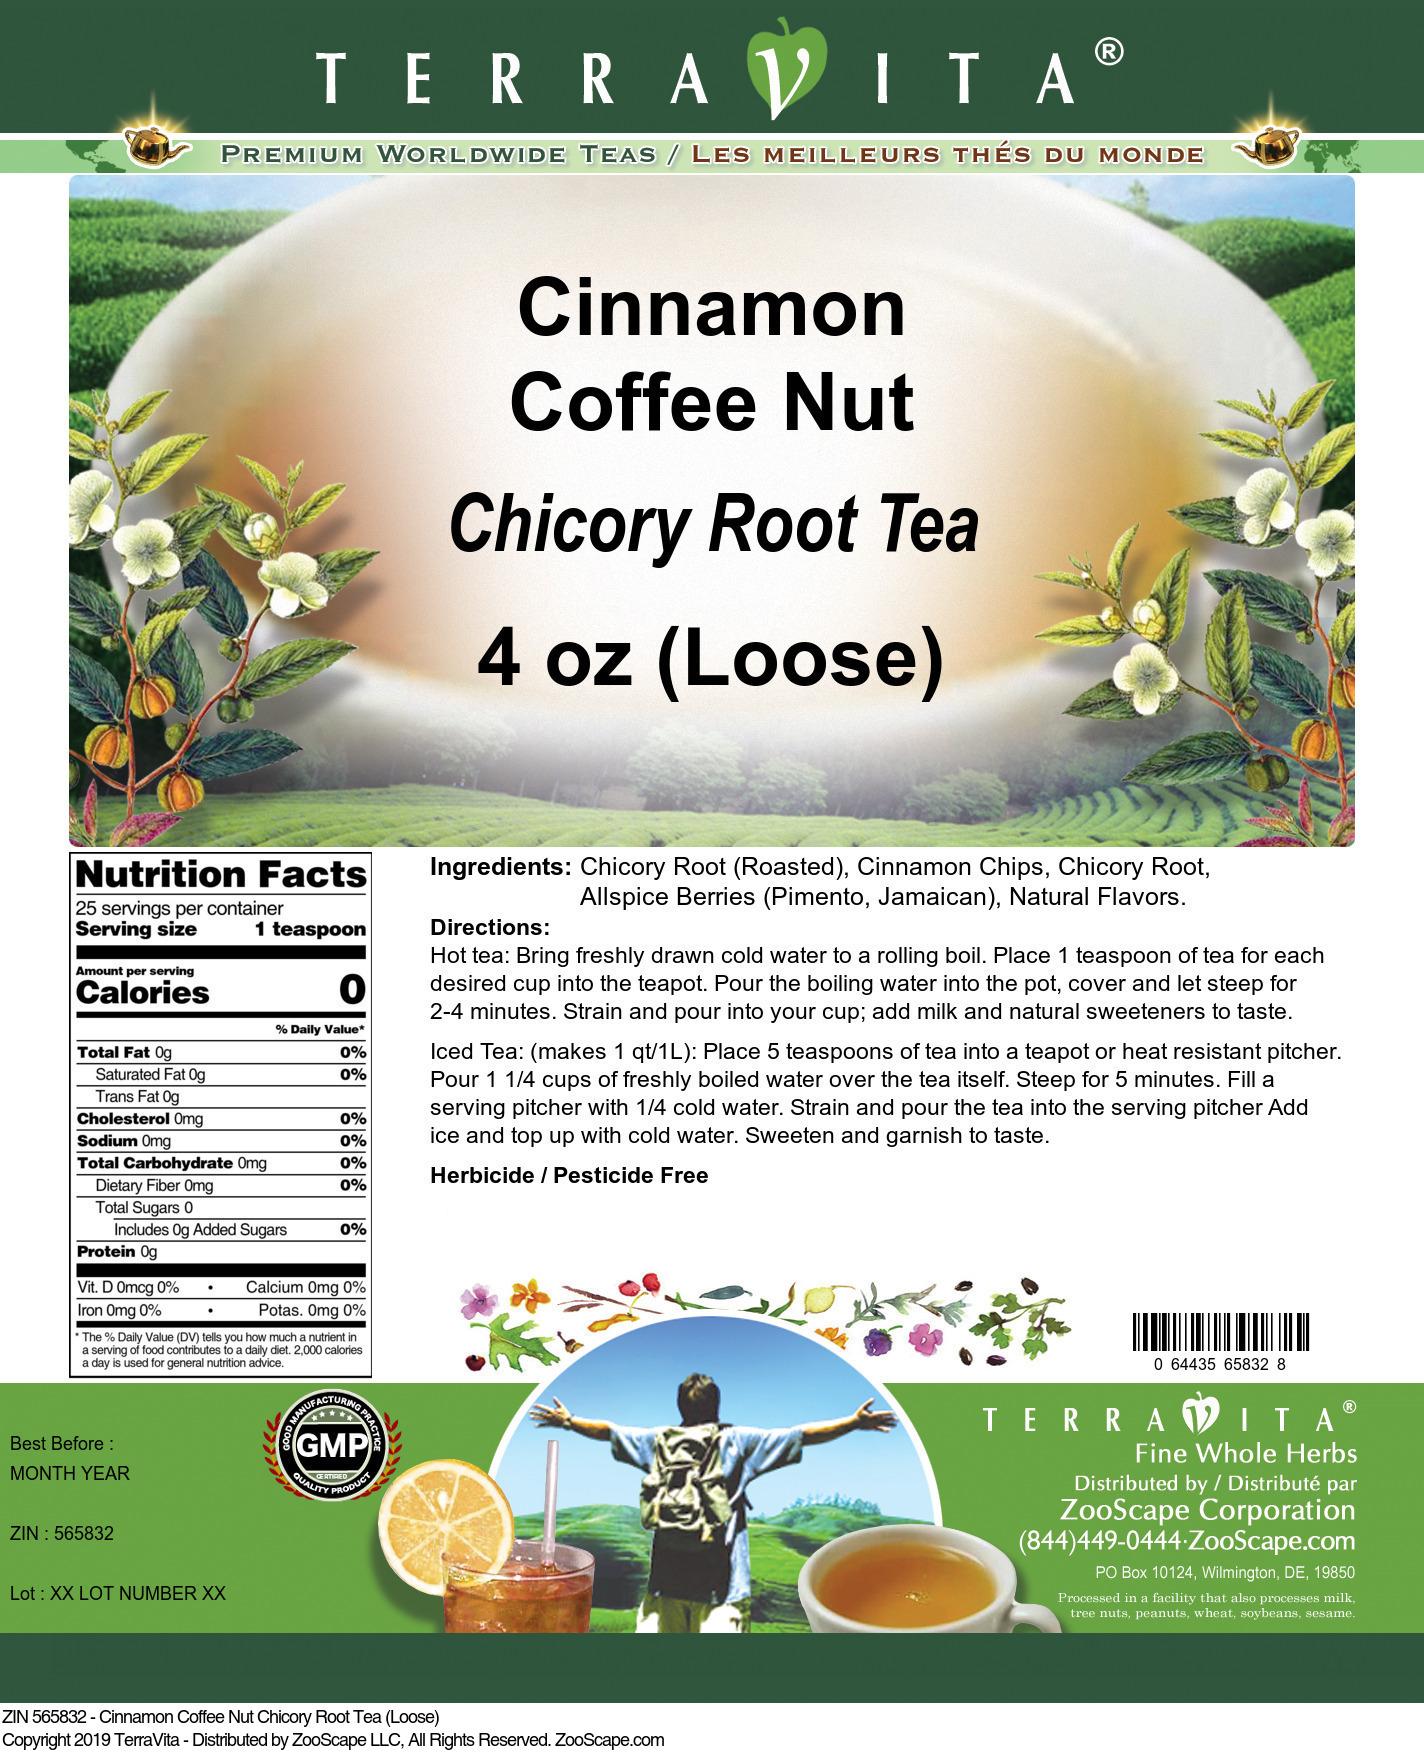 Cinnamon Coffee Nut Chicory Root